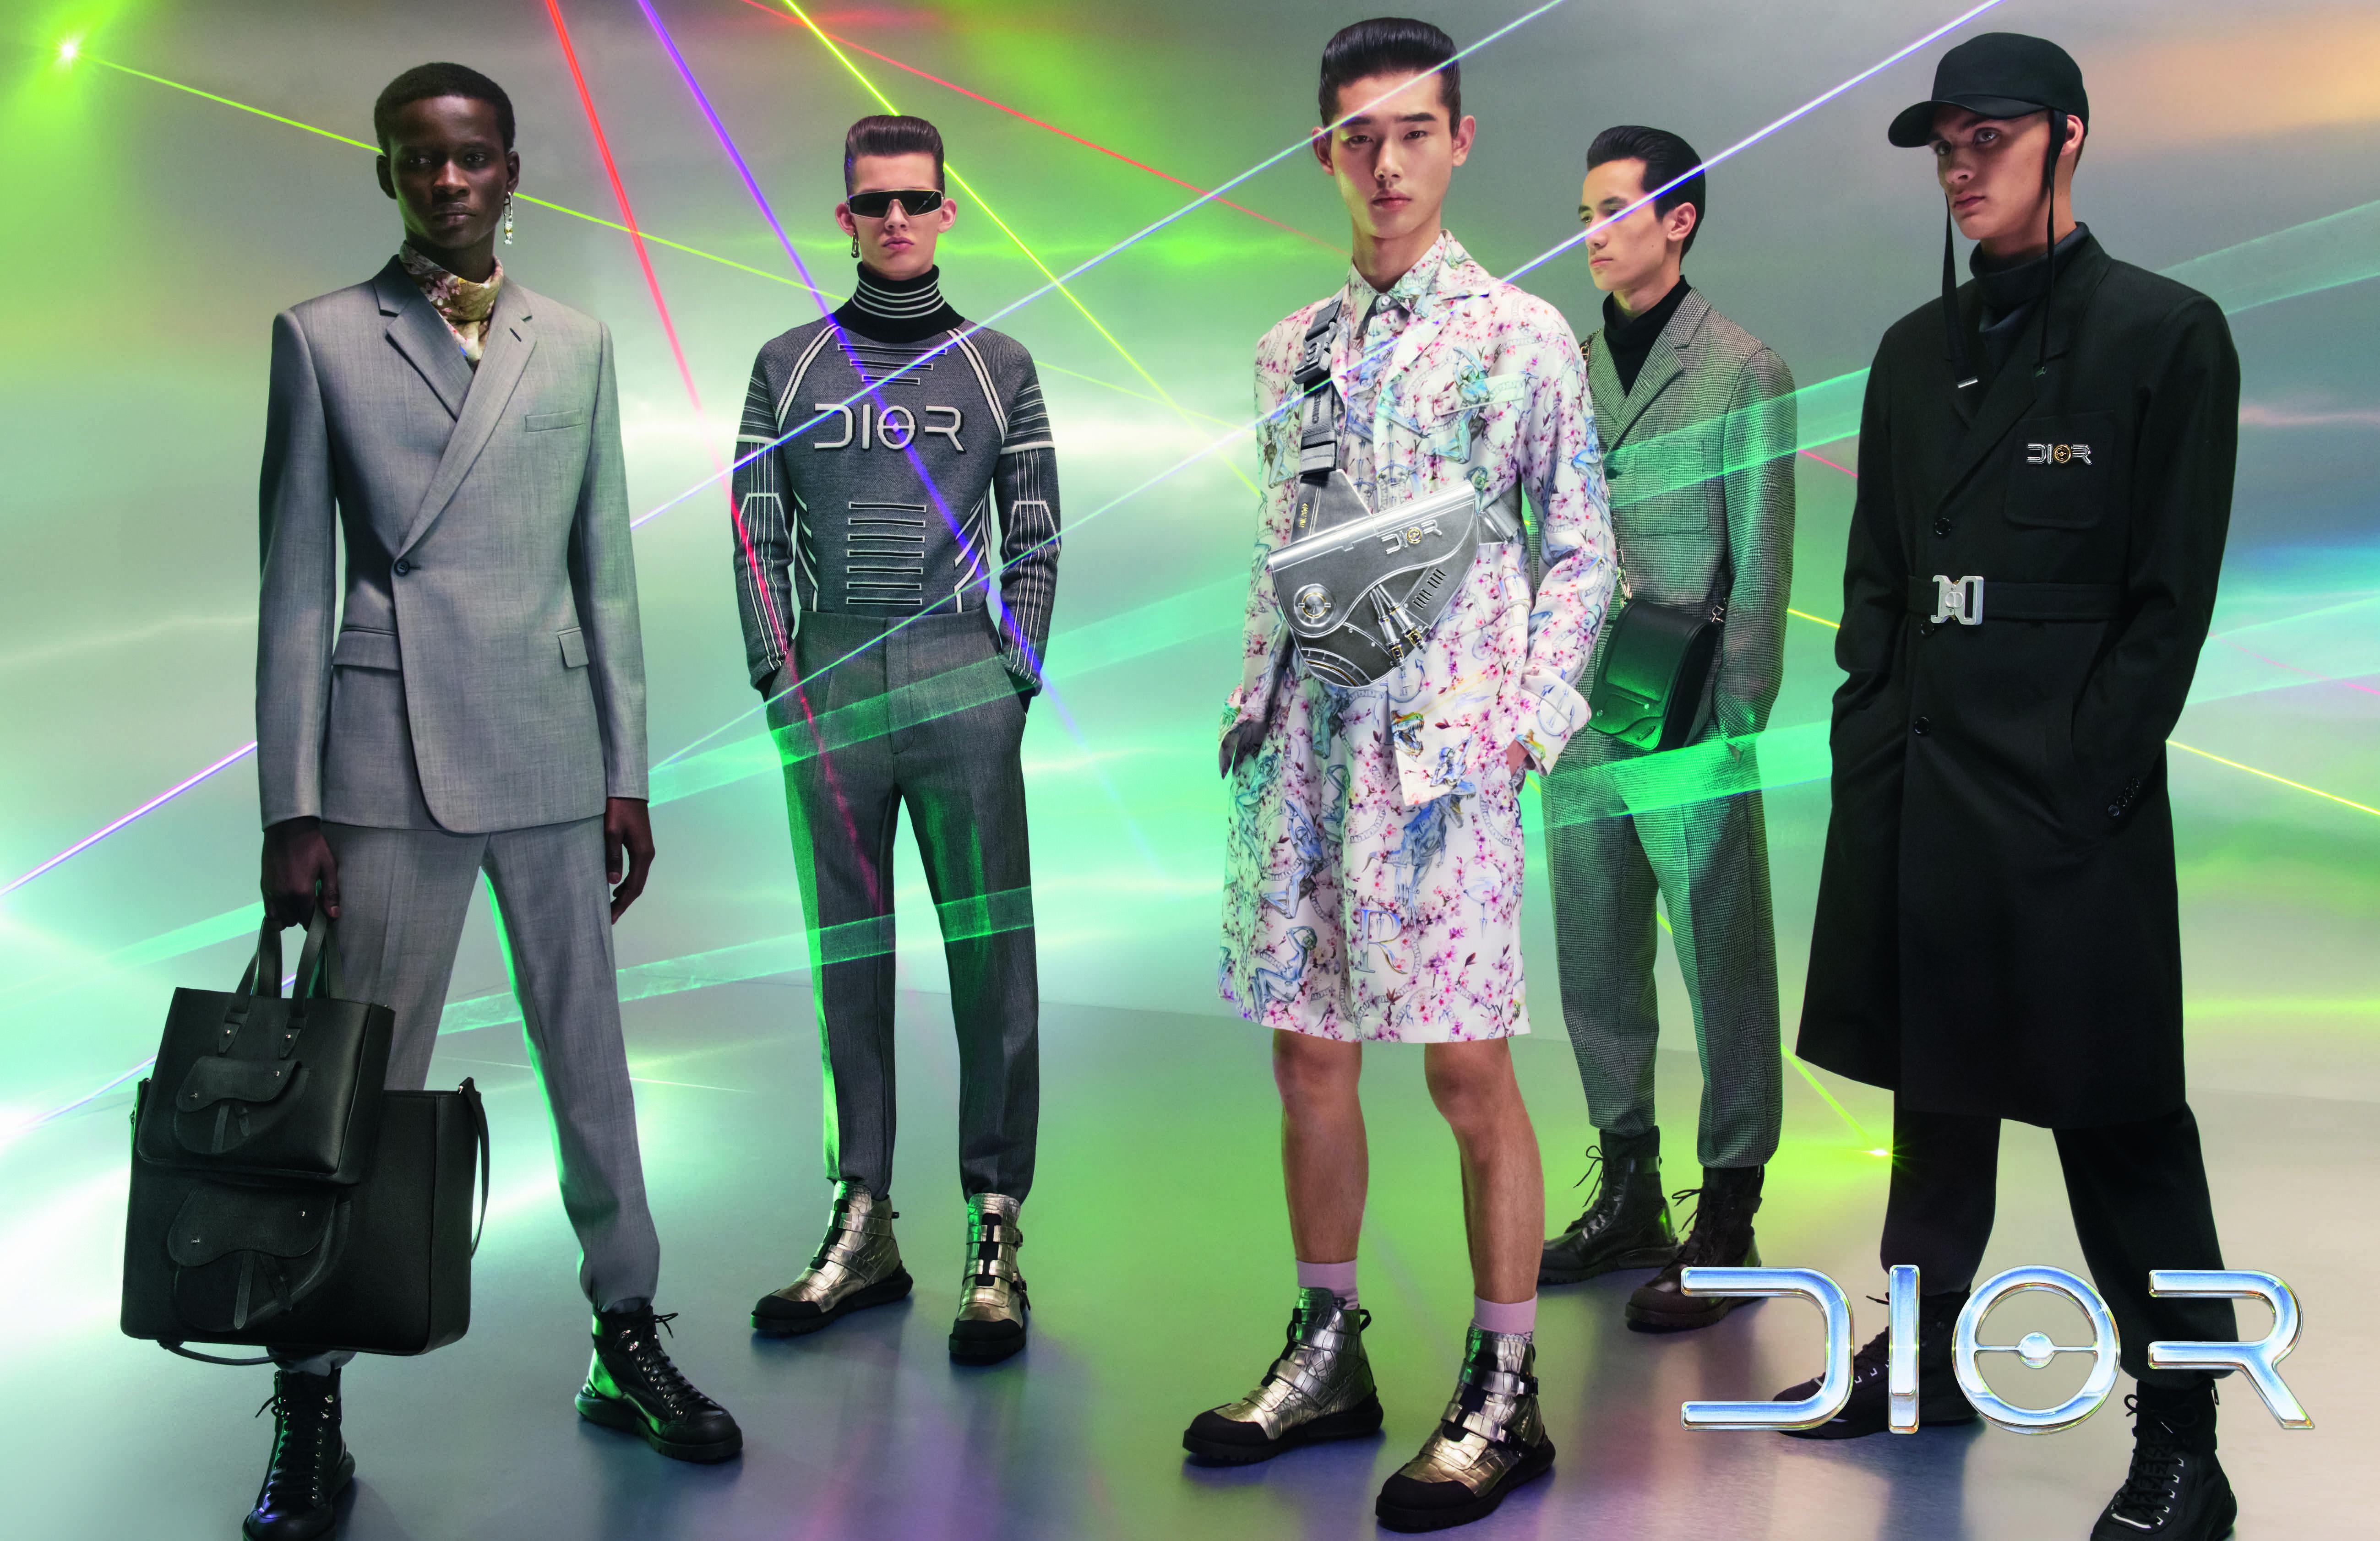 The Dior men's pre-fall advertising campaign.